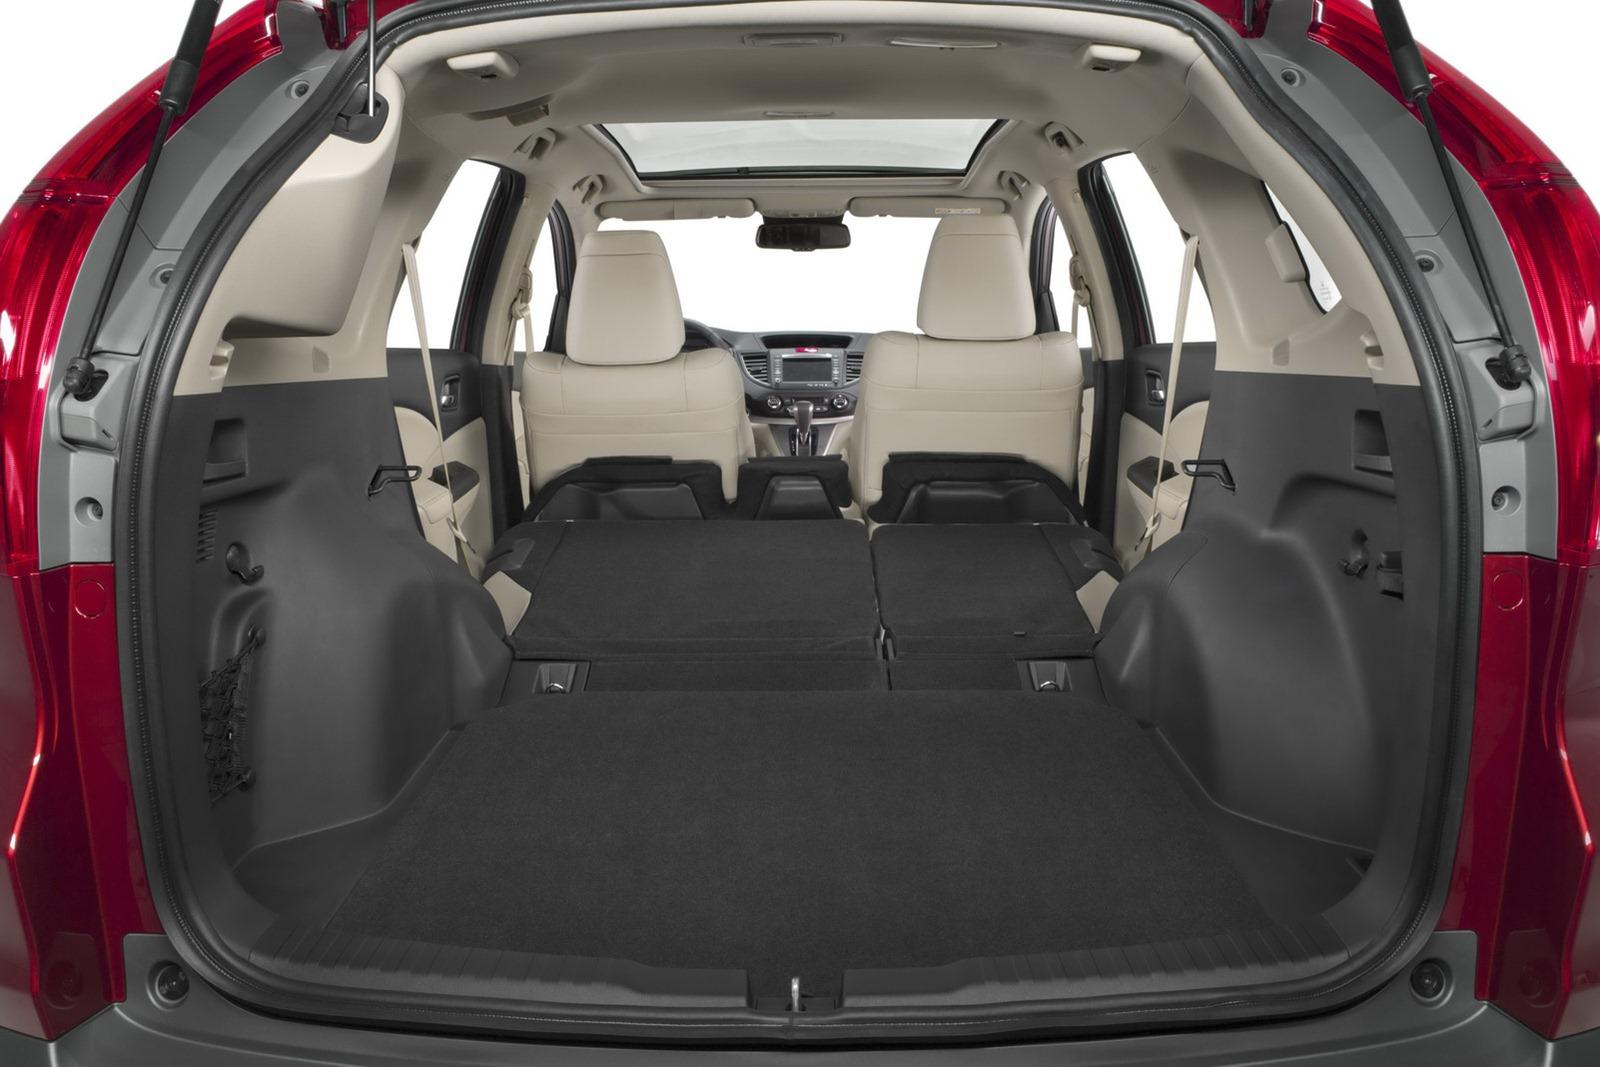 2013 Honda CR-V iç dizaynı